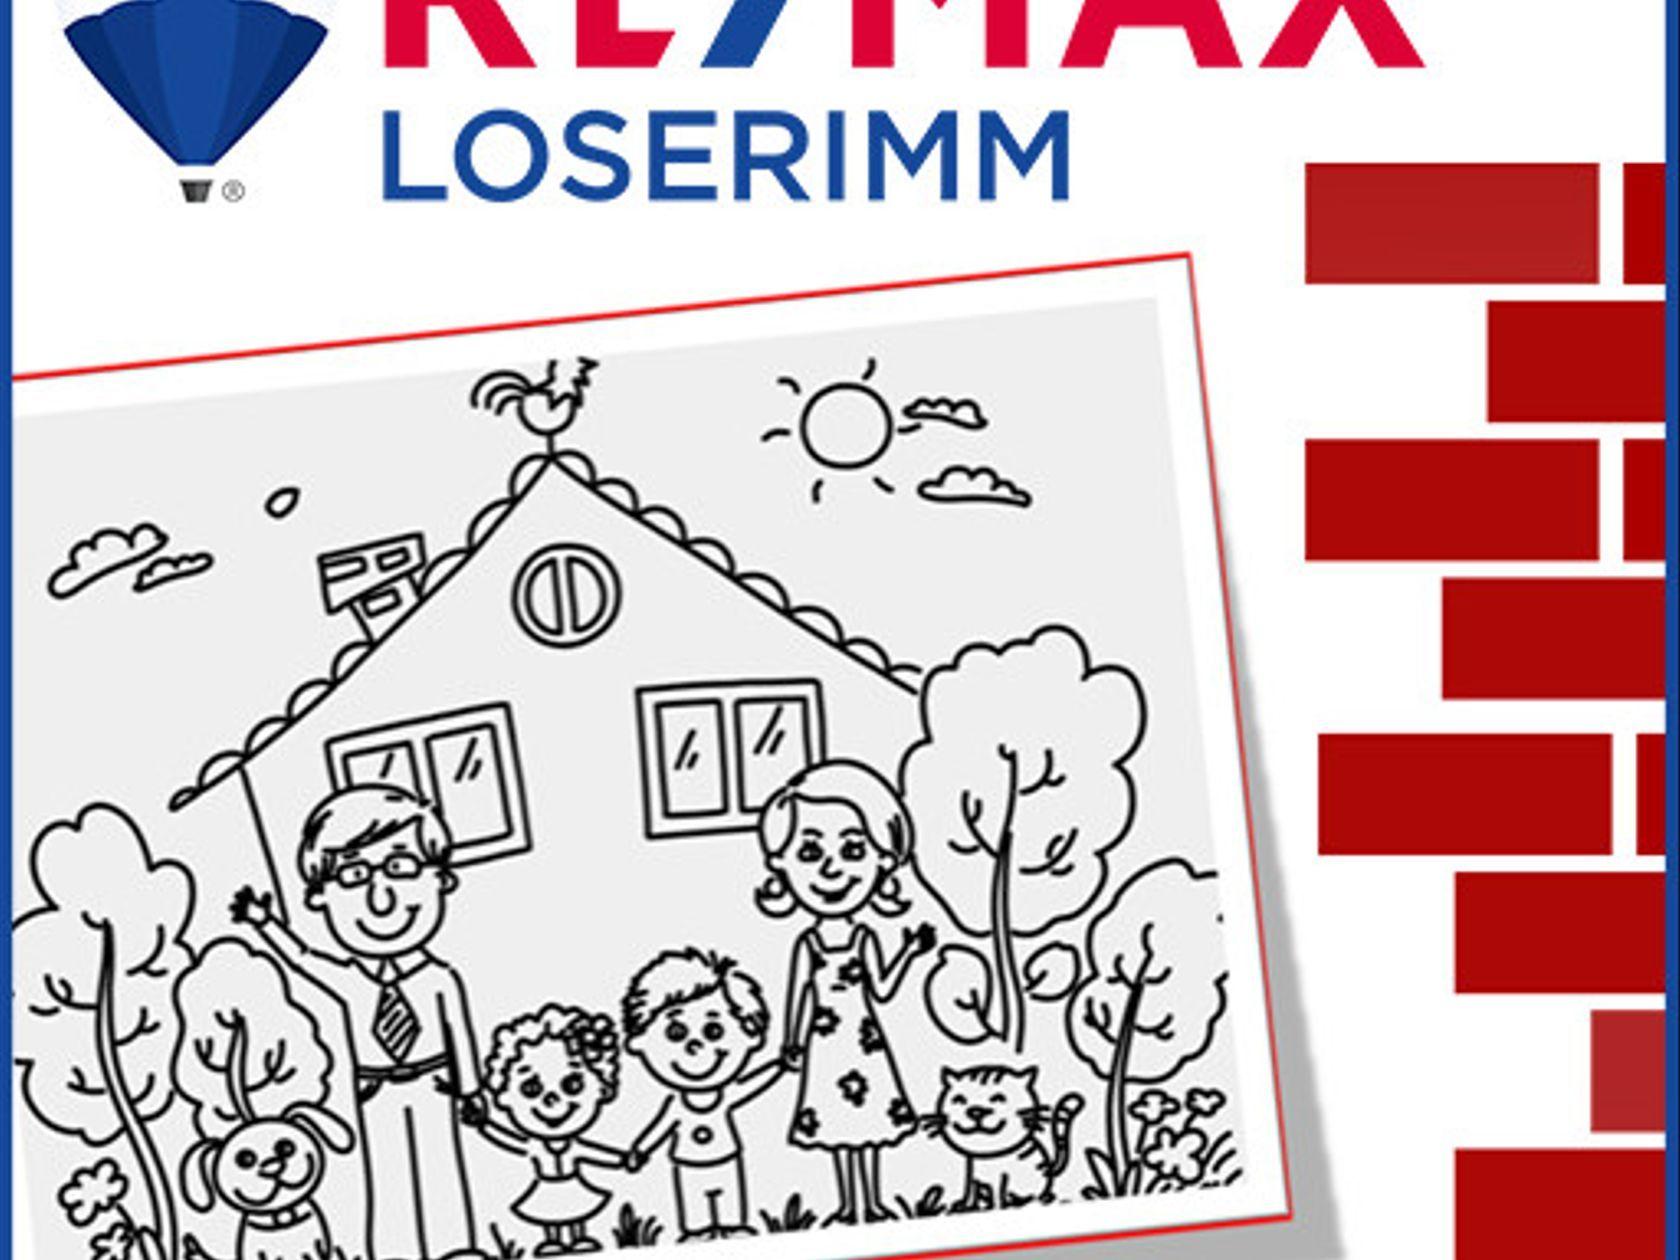 RE/MAX Loserimm Rho - Foto 3